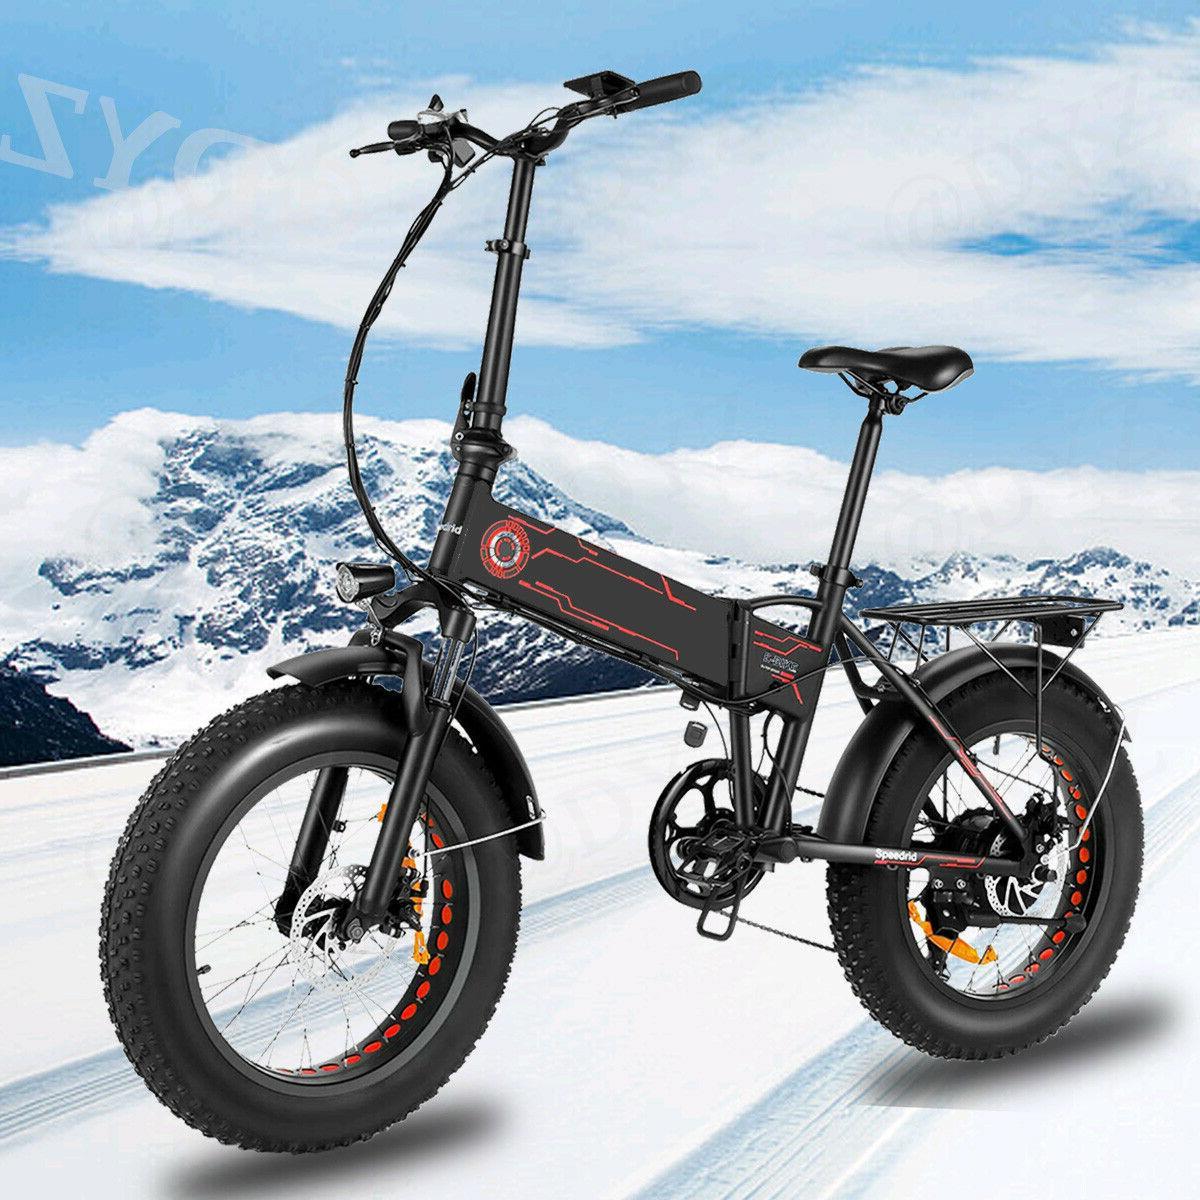 500W 20INCH Folding Electric Bike Beach Snow EBike Fat -Tire